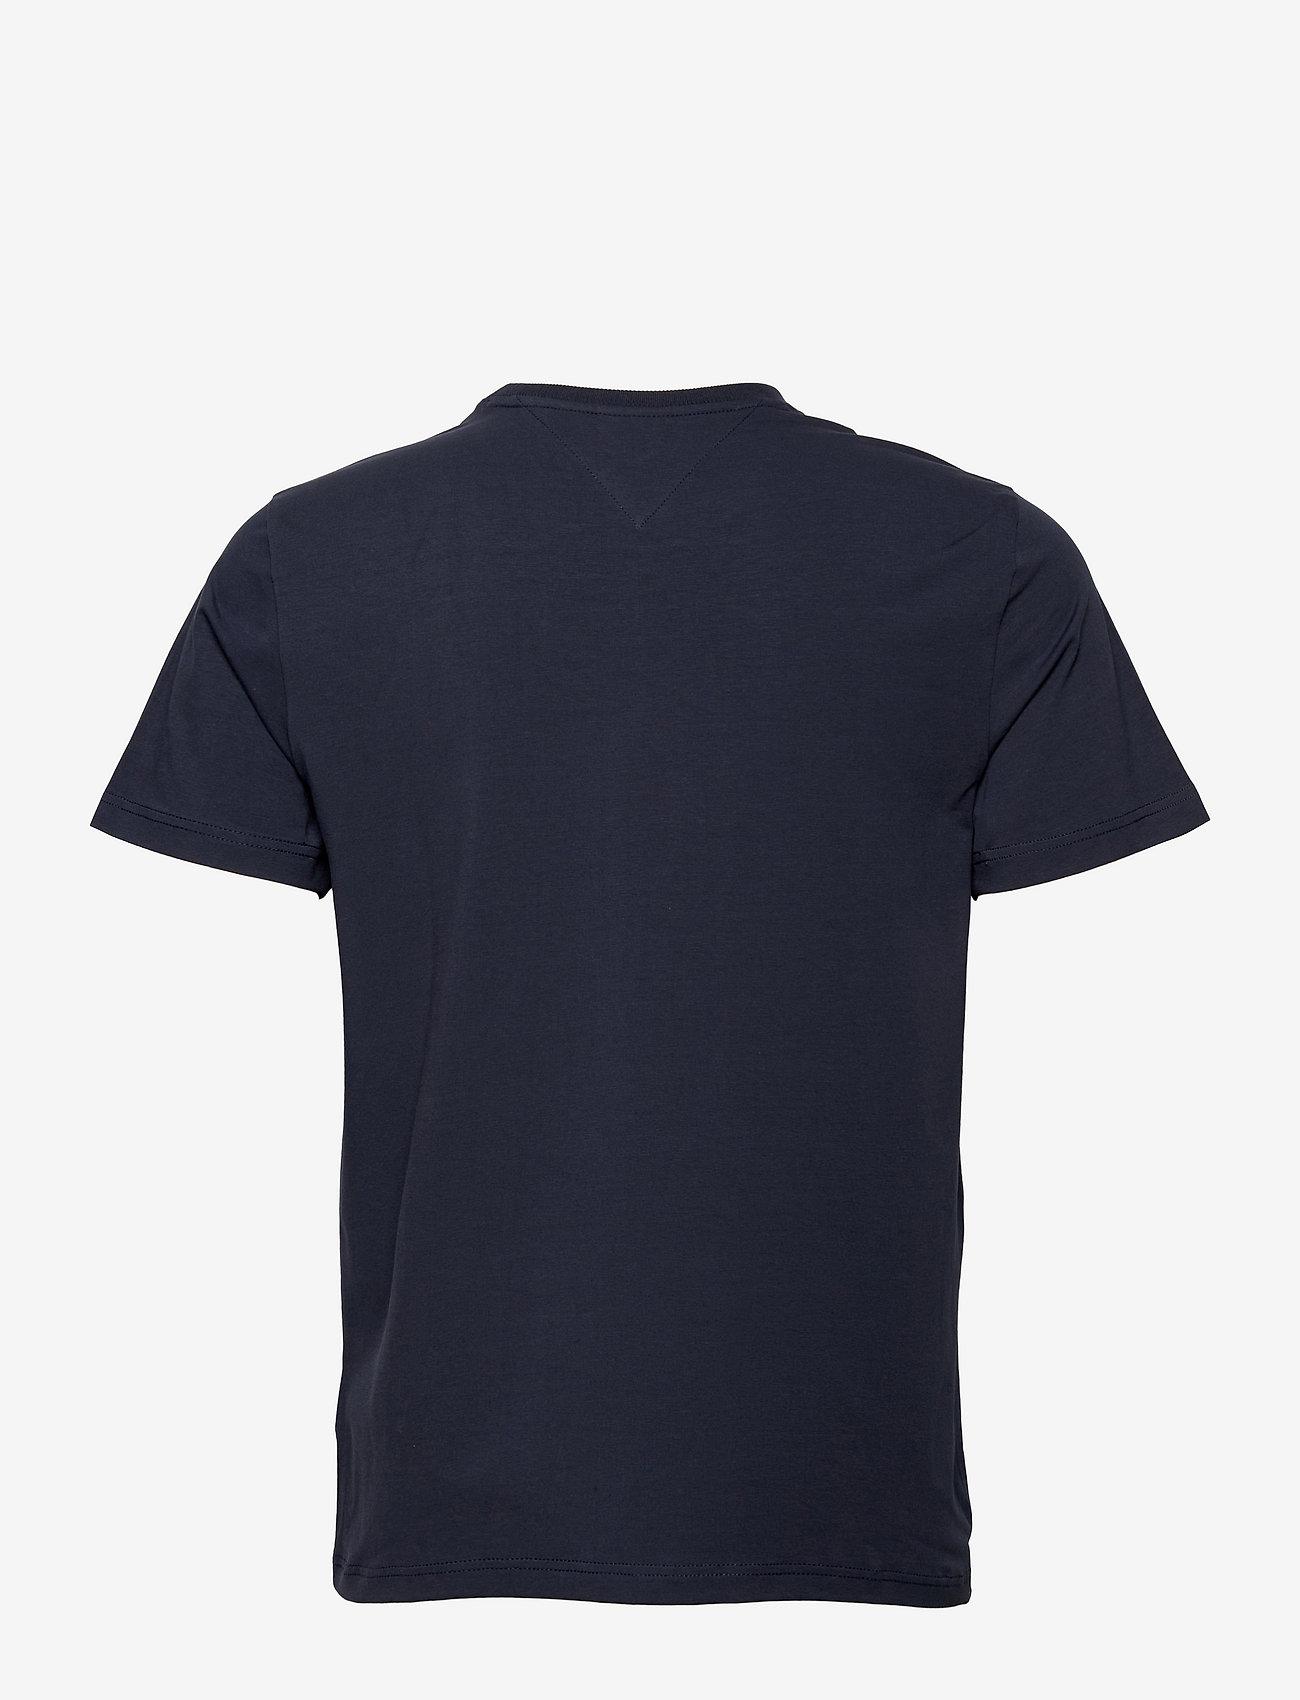 Tommy Jeans - TJM COLOR CORP LOGO TEE - kortärmade t-shirts - twilight navy - 1